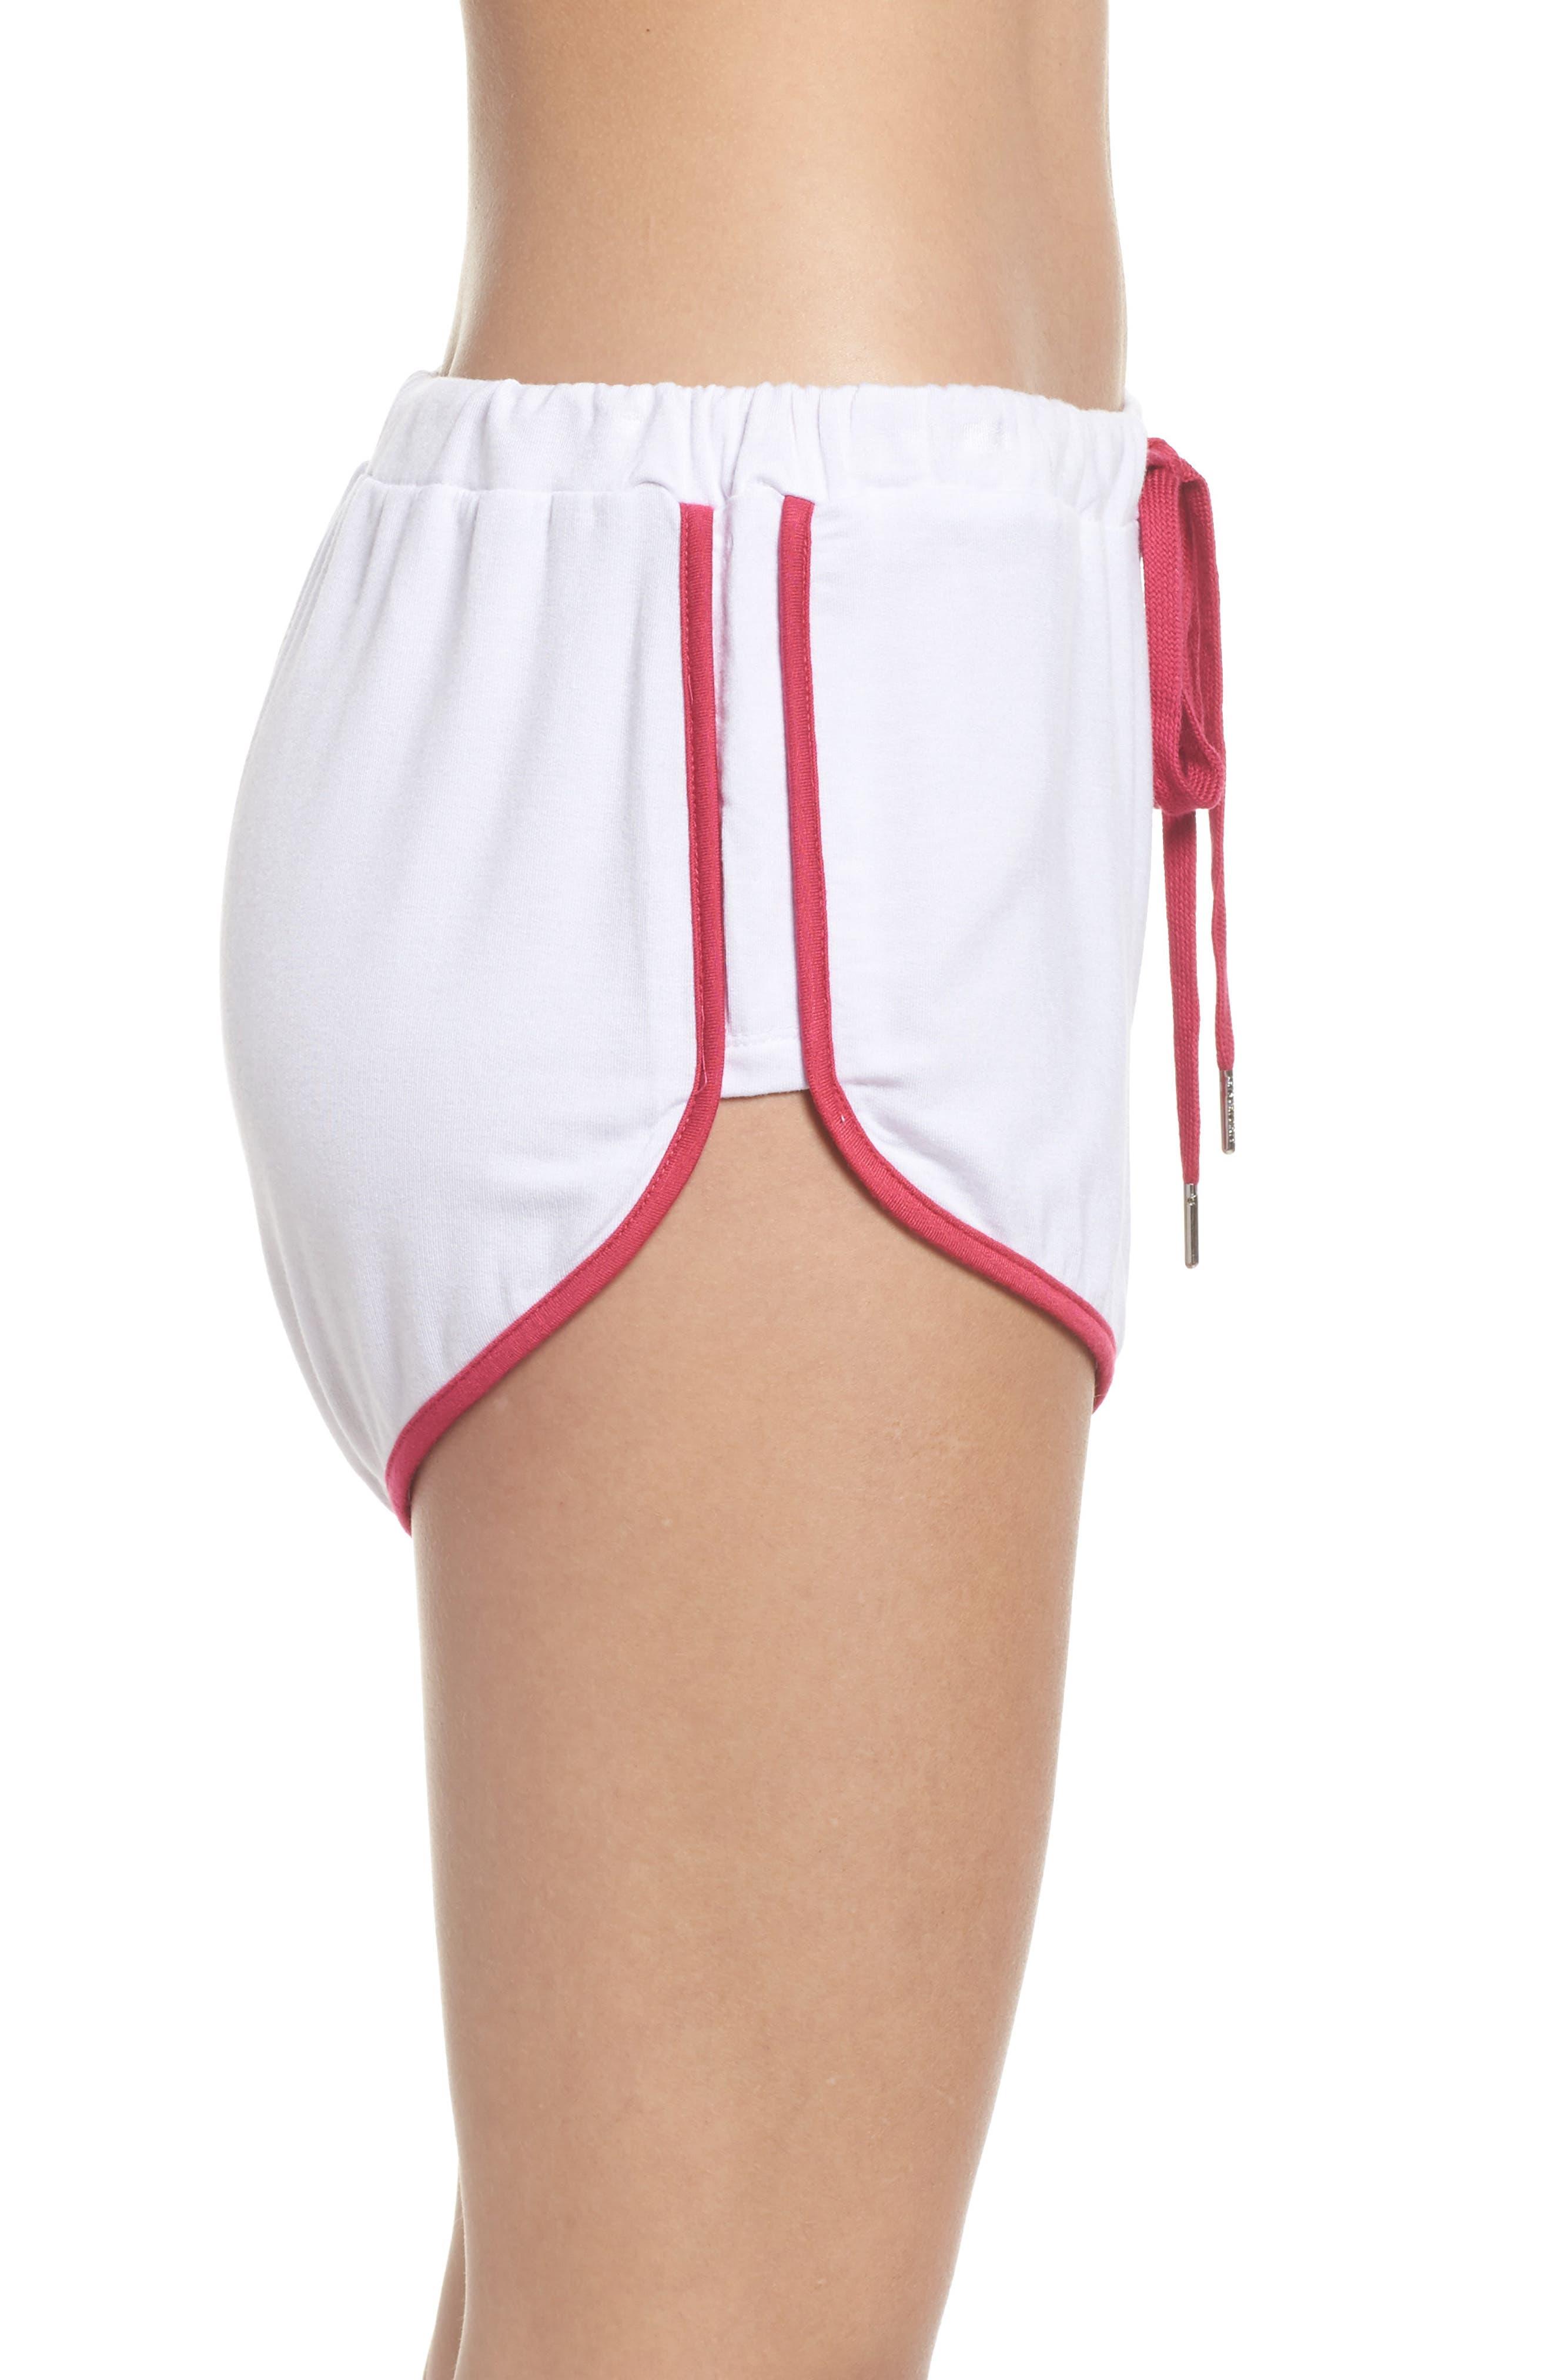 Lounge Shorts,                             Alternate thumbnail 3, color,                             699